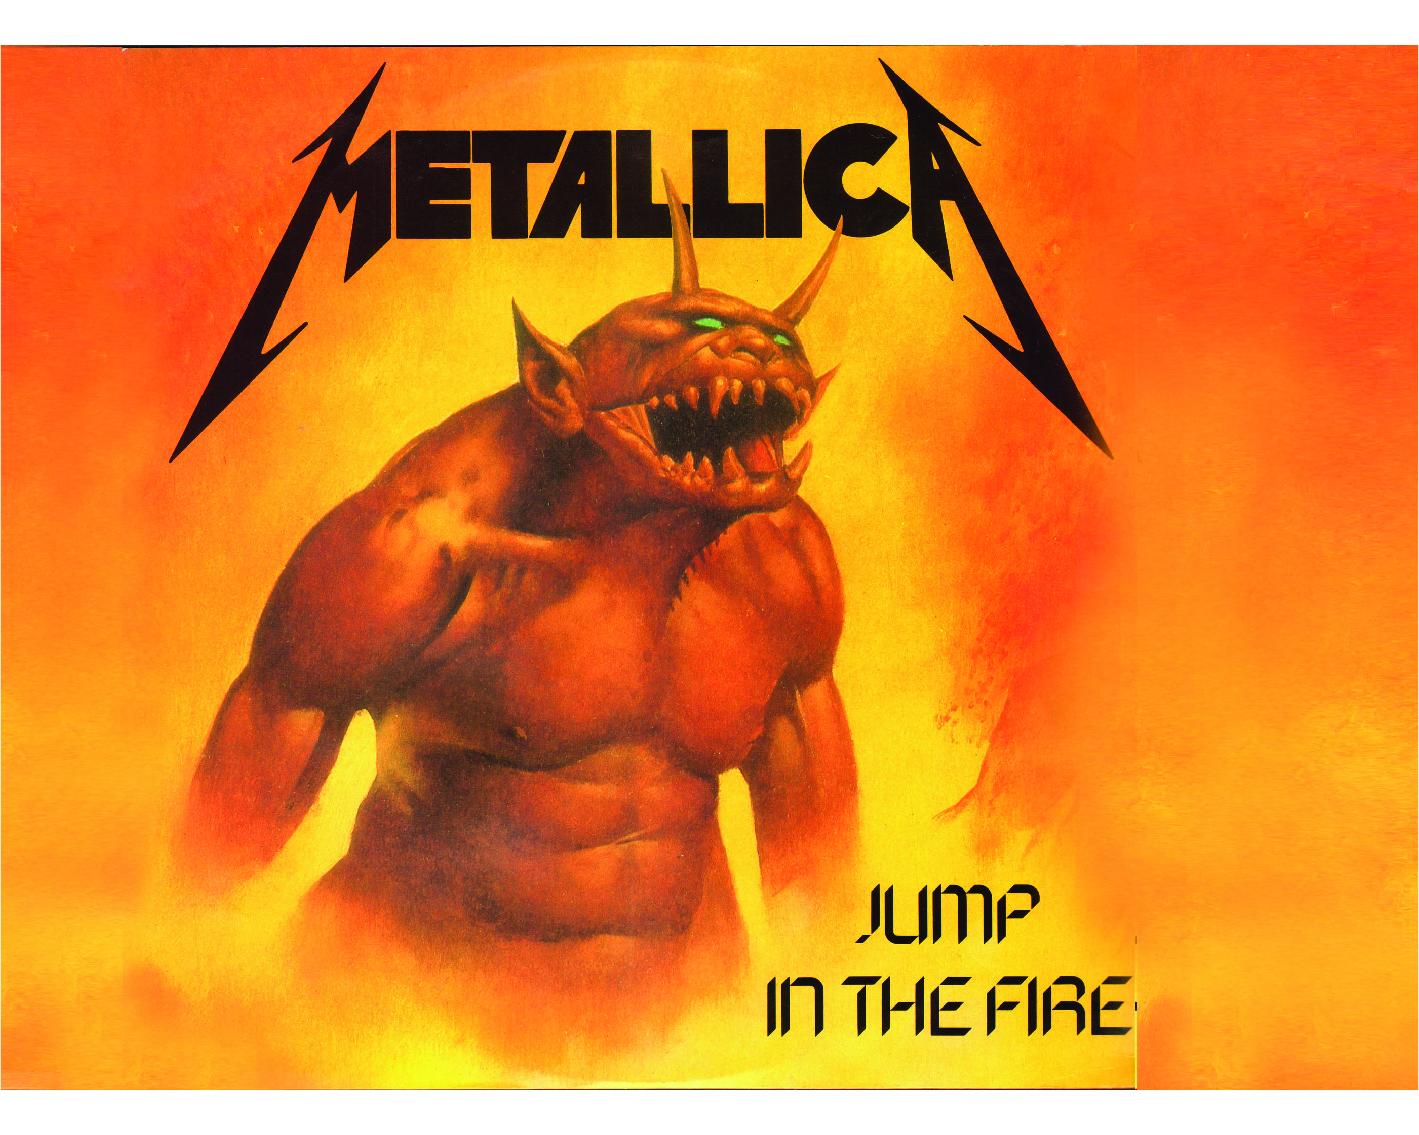 Metallica 1-4-01